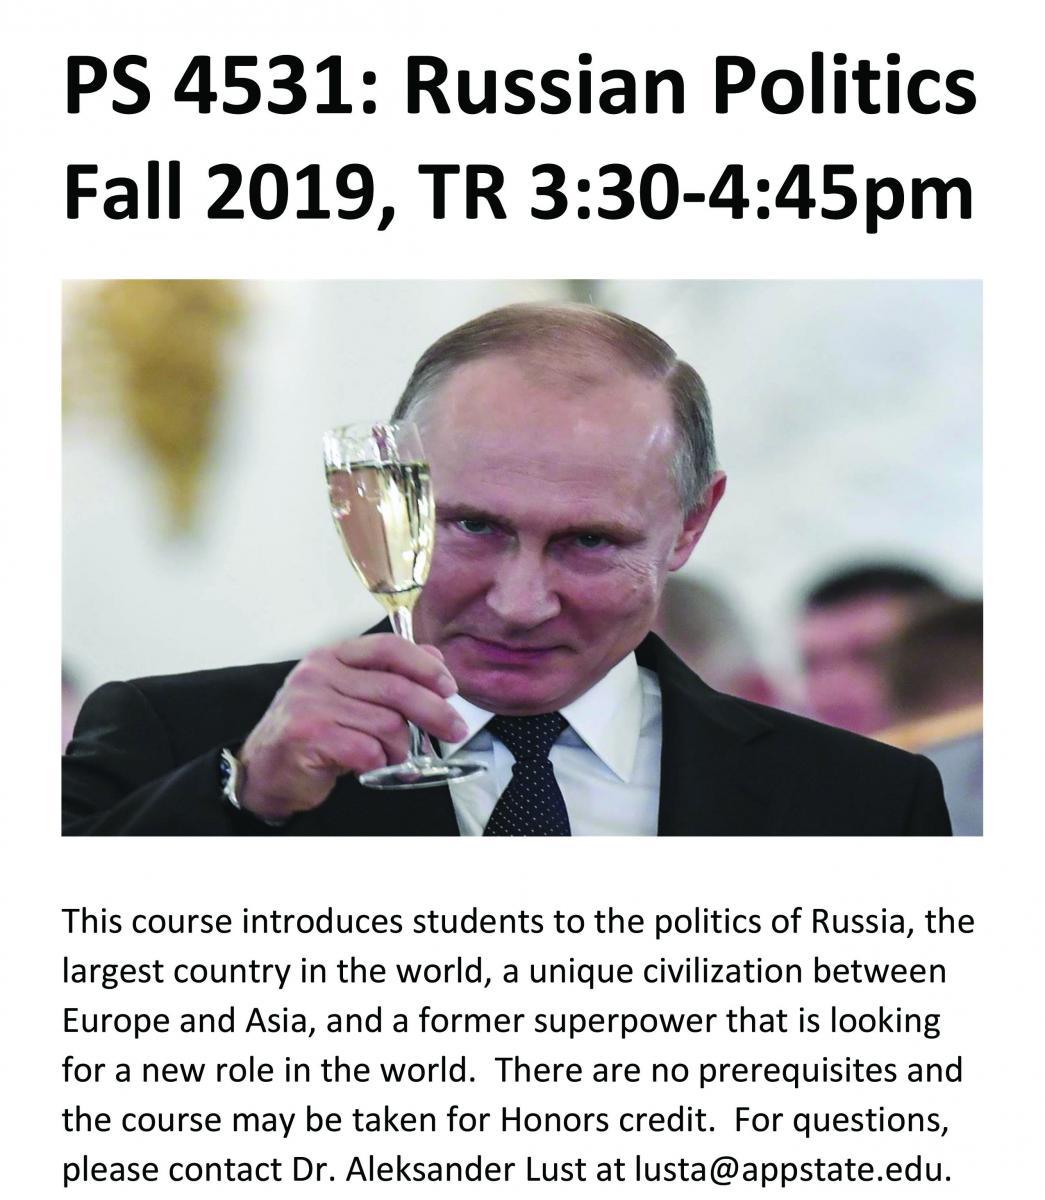 russian_politics_poster.jpg